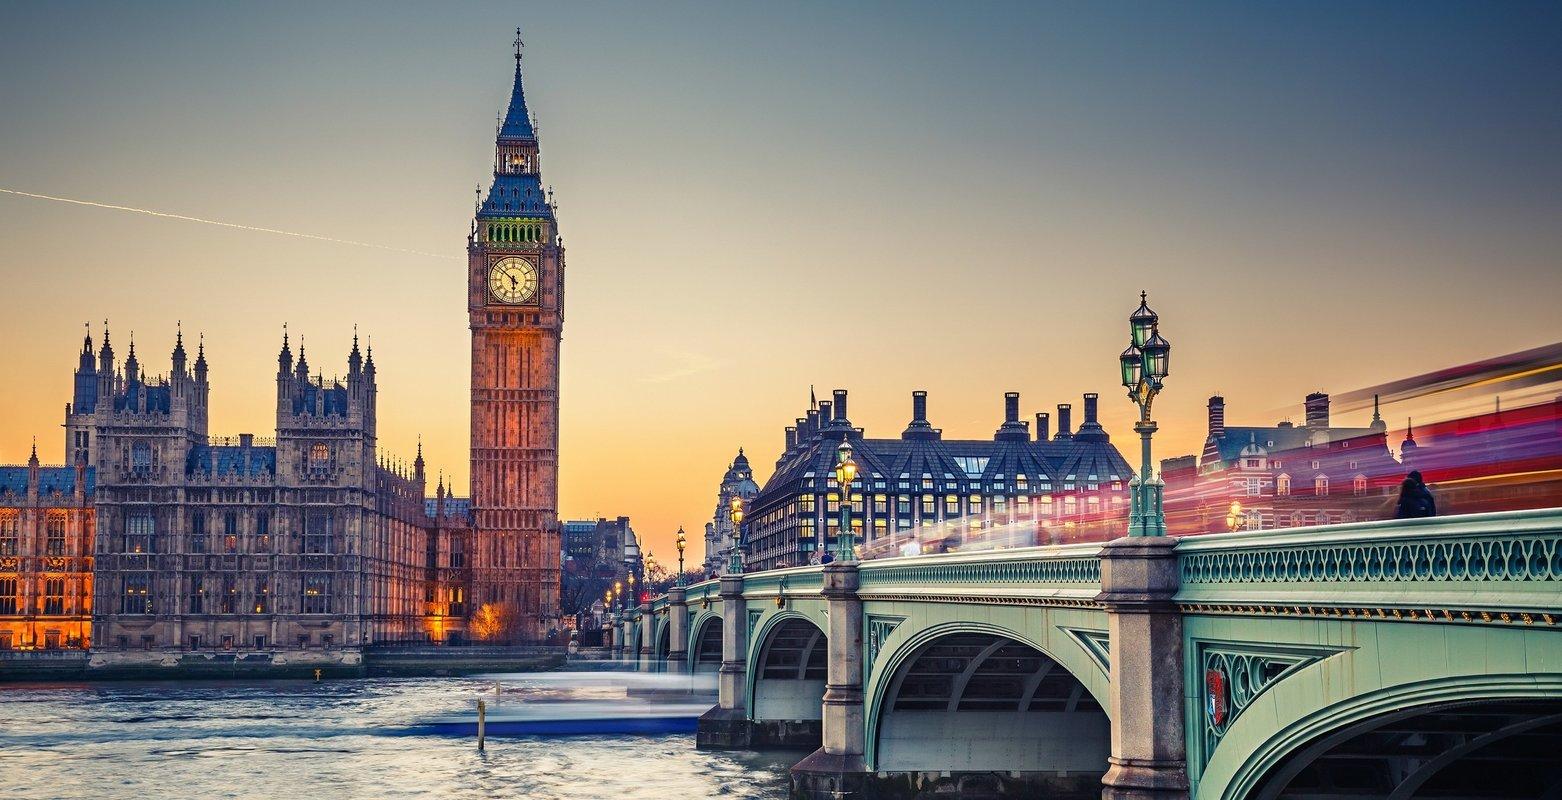 United Kingdom - Collection